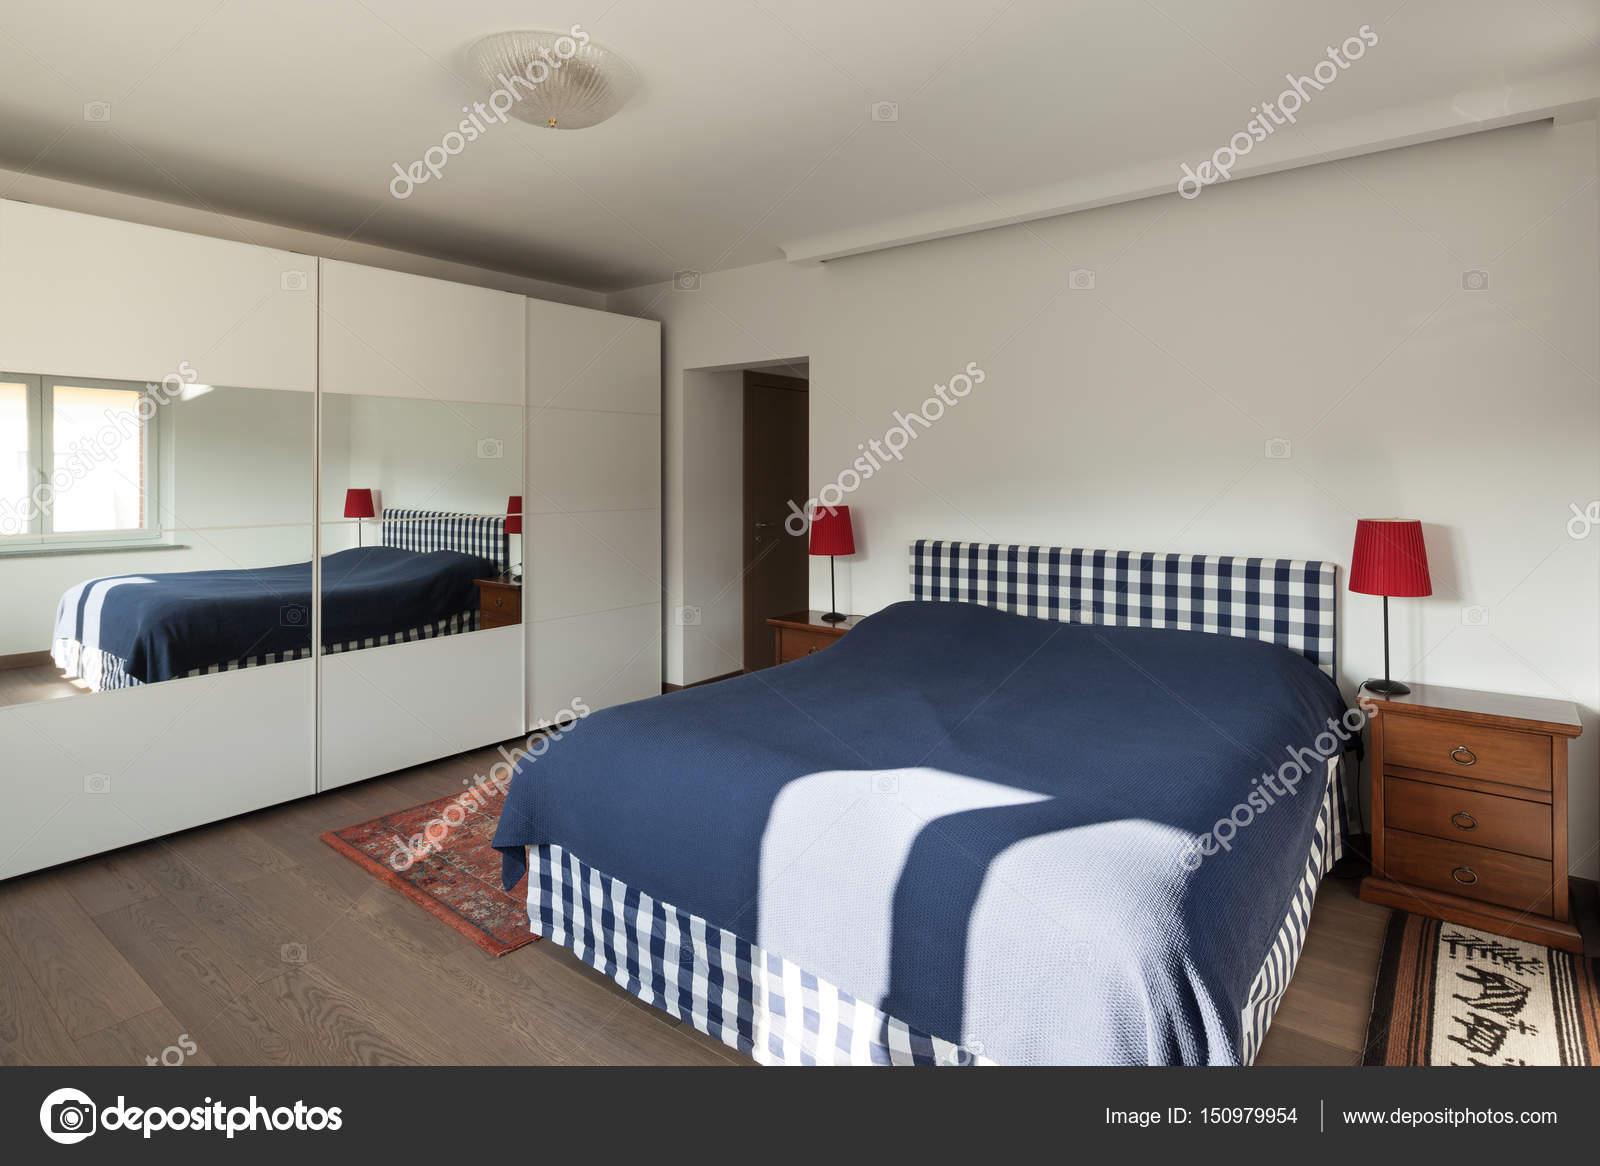 Slaapkamer Houten Vloer : Slaapkamer met houten vloer u stockfoto zveiger